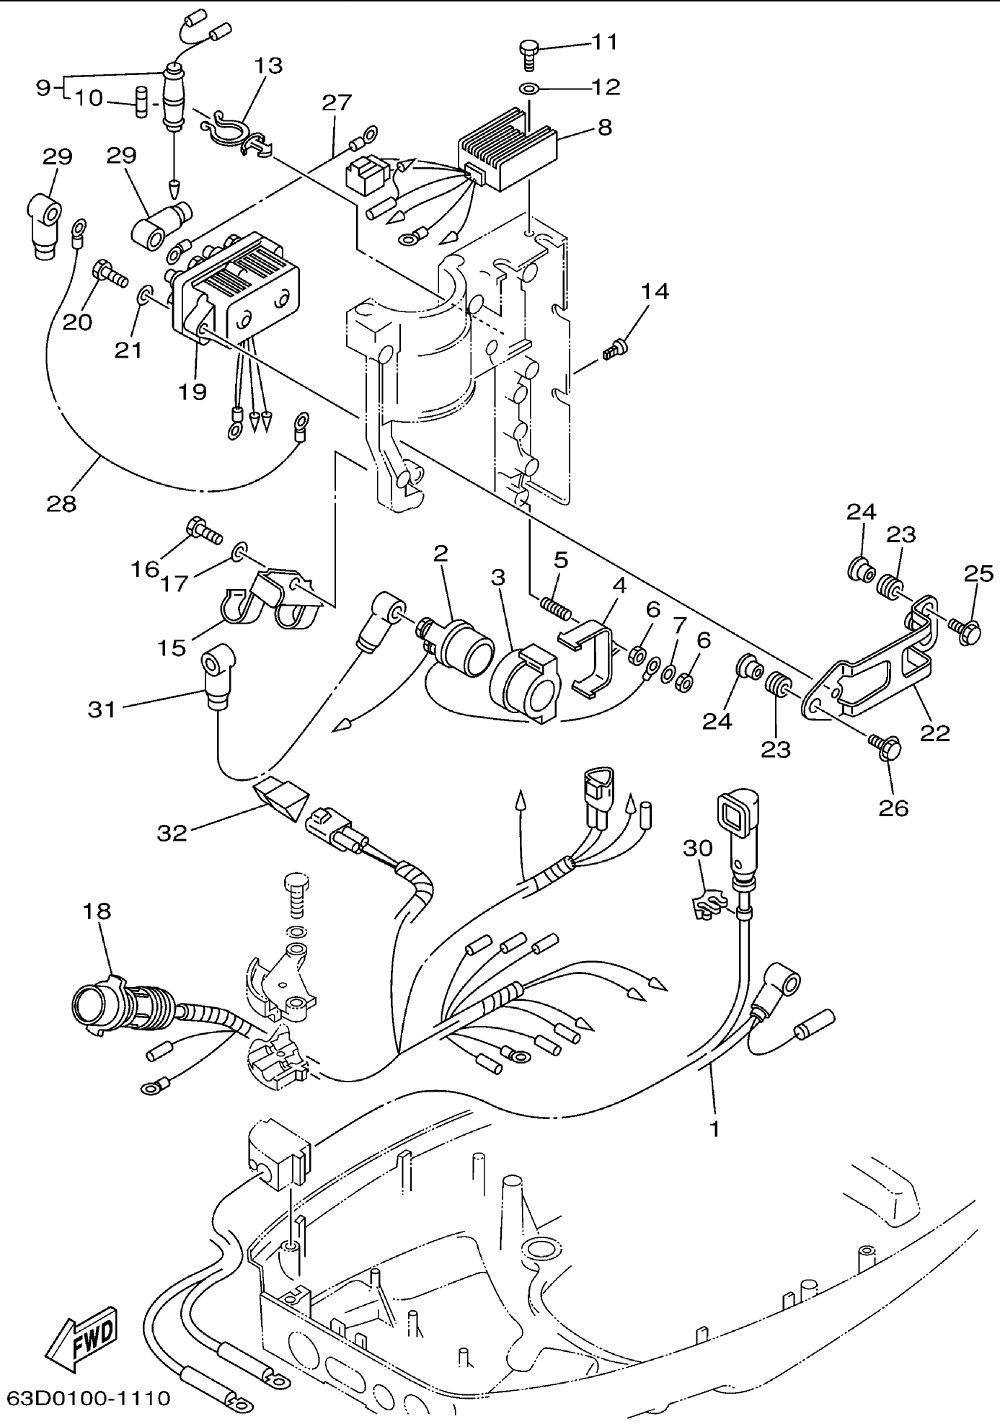 medium resolution of wiring diagram for 40 hp yamaha c40tlryyamaha 40 wiring diagram 21